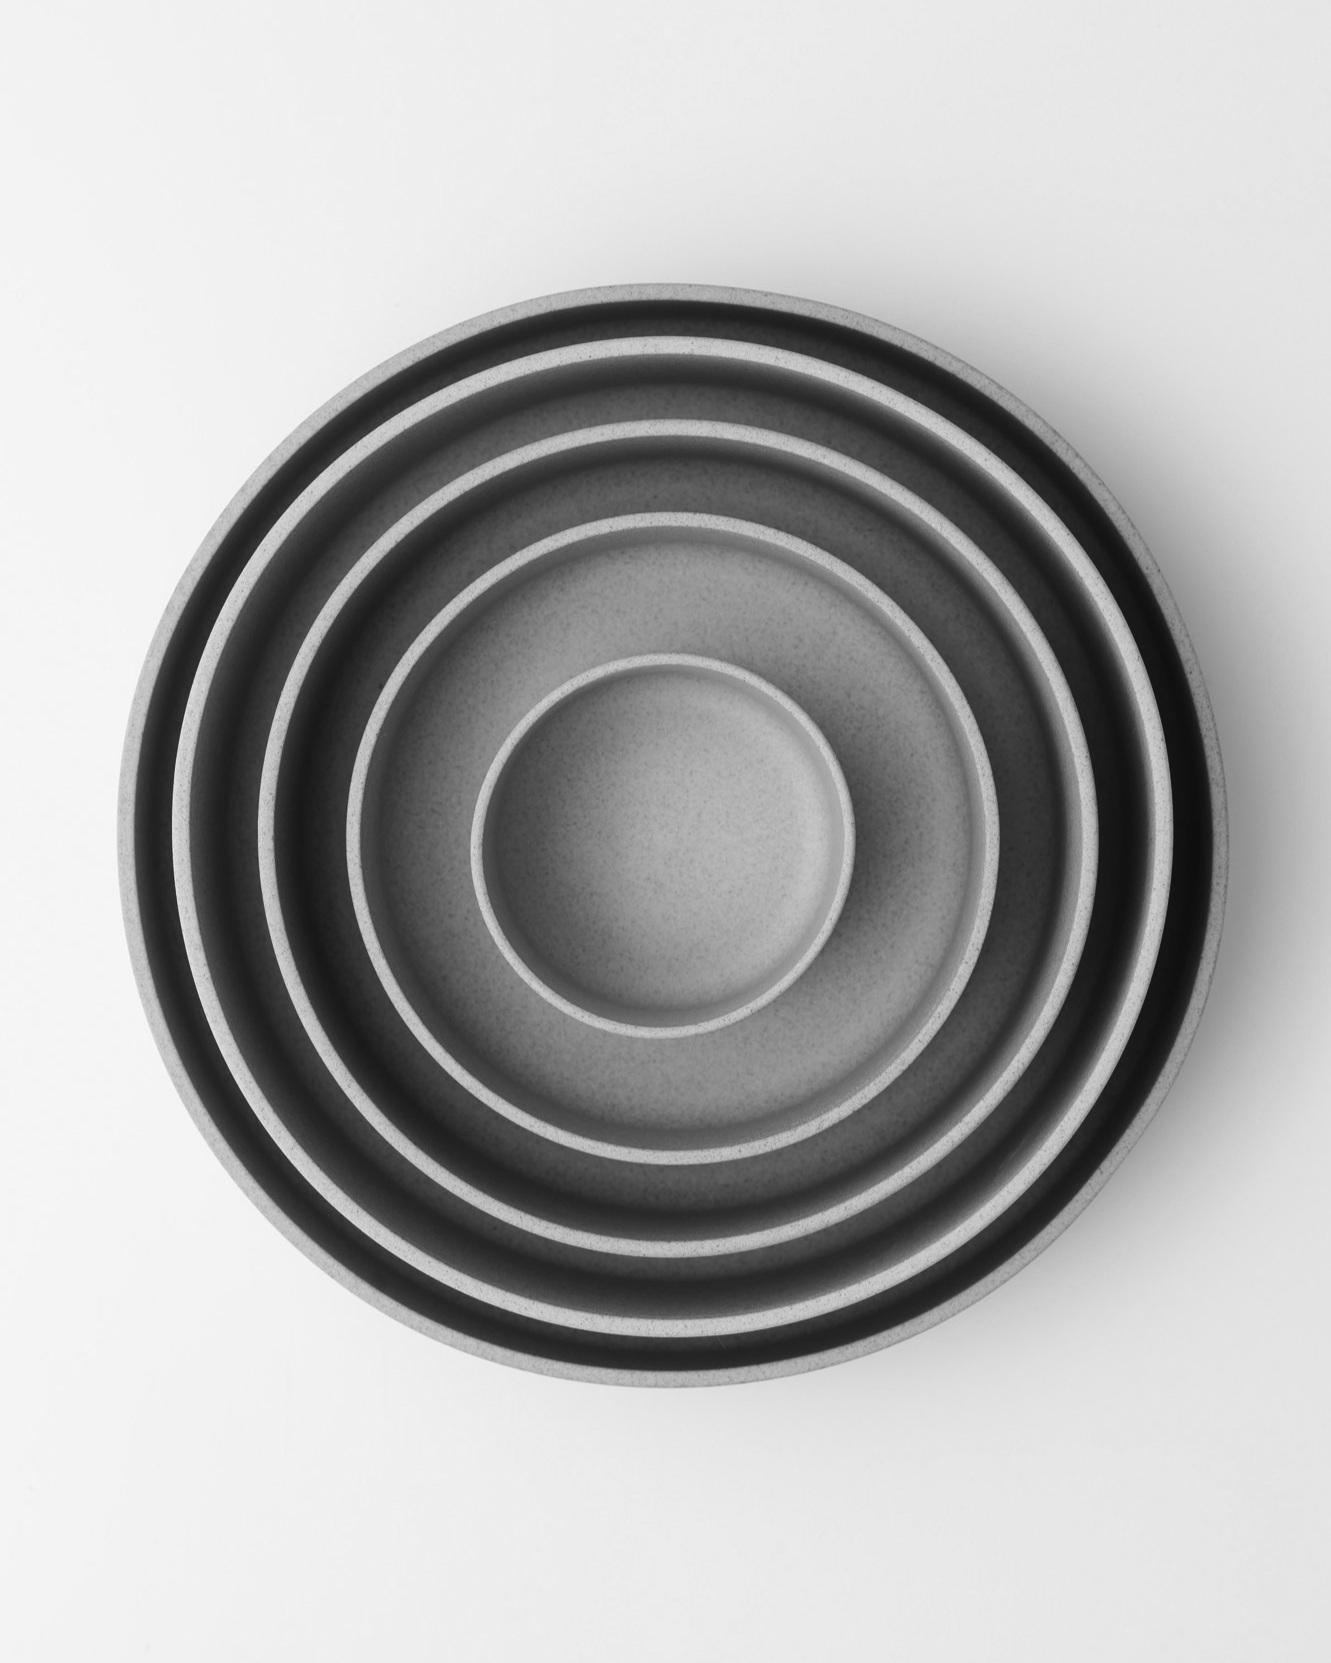 Native%26Co-Hasami-Porcelain-18.jpg